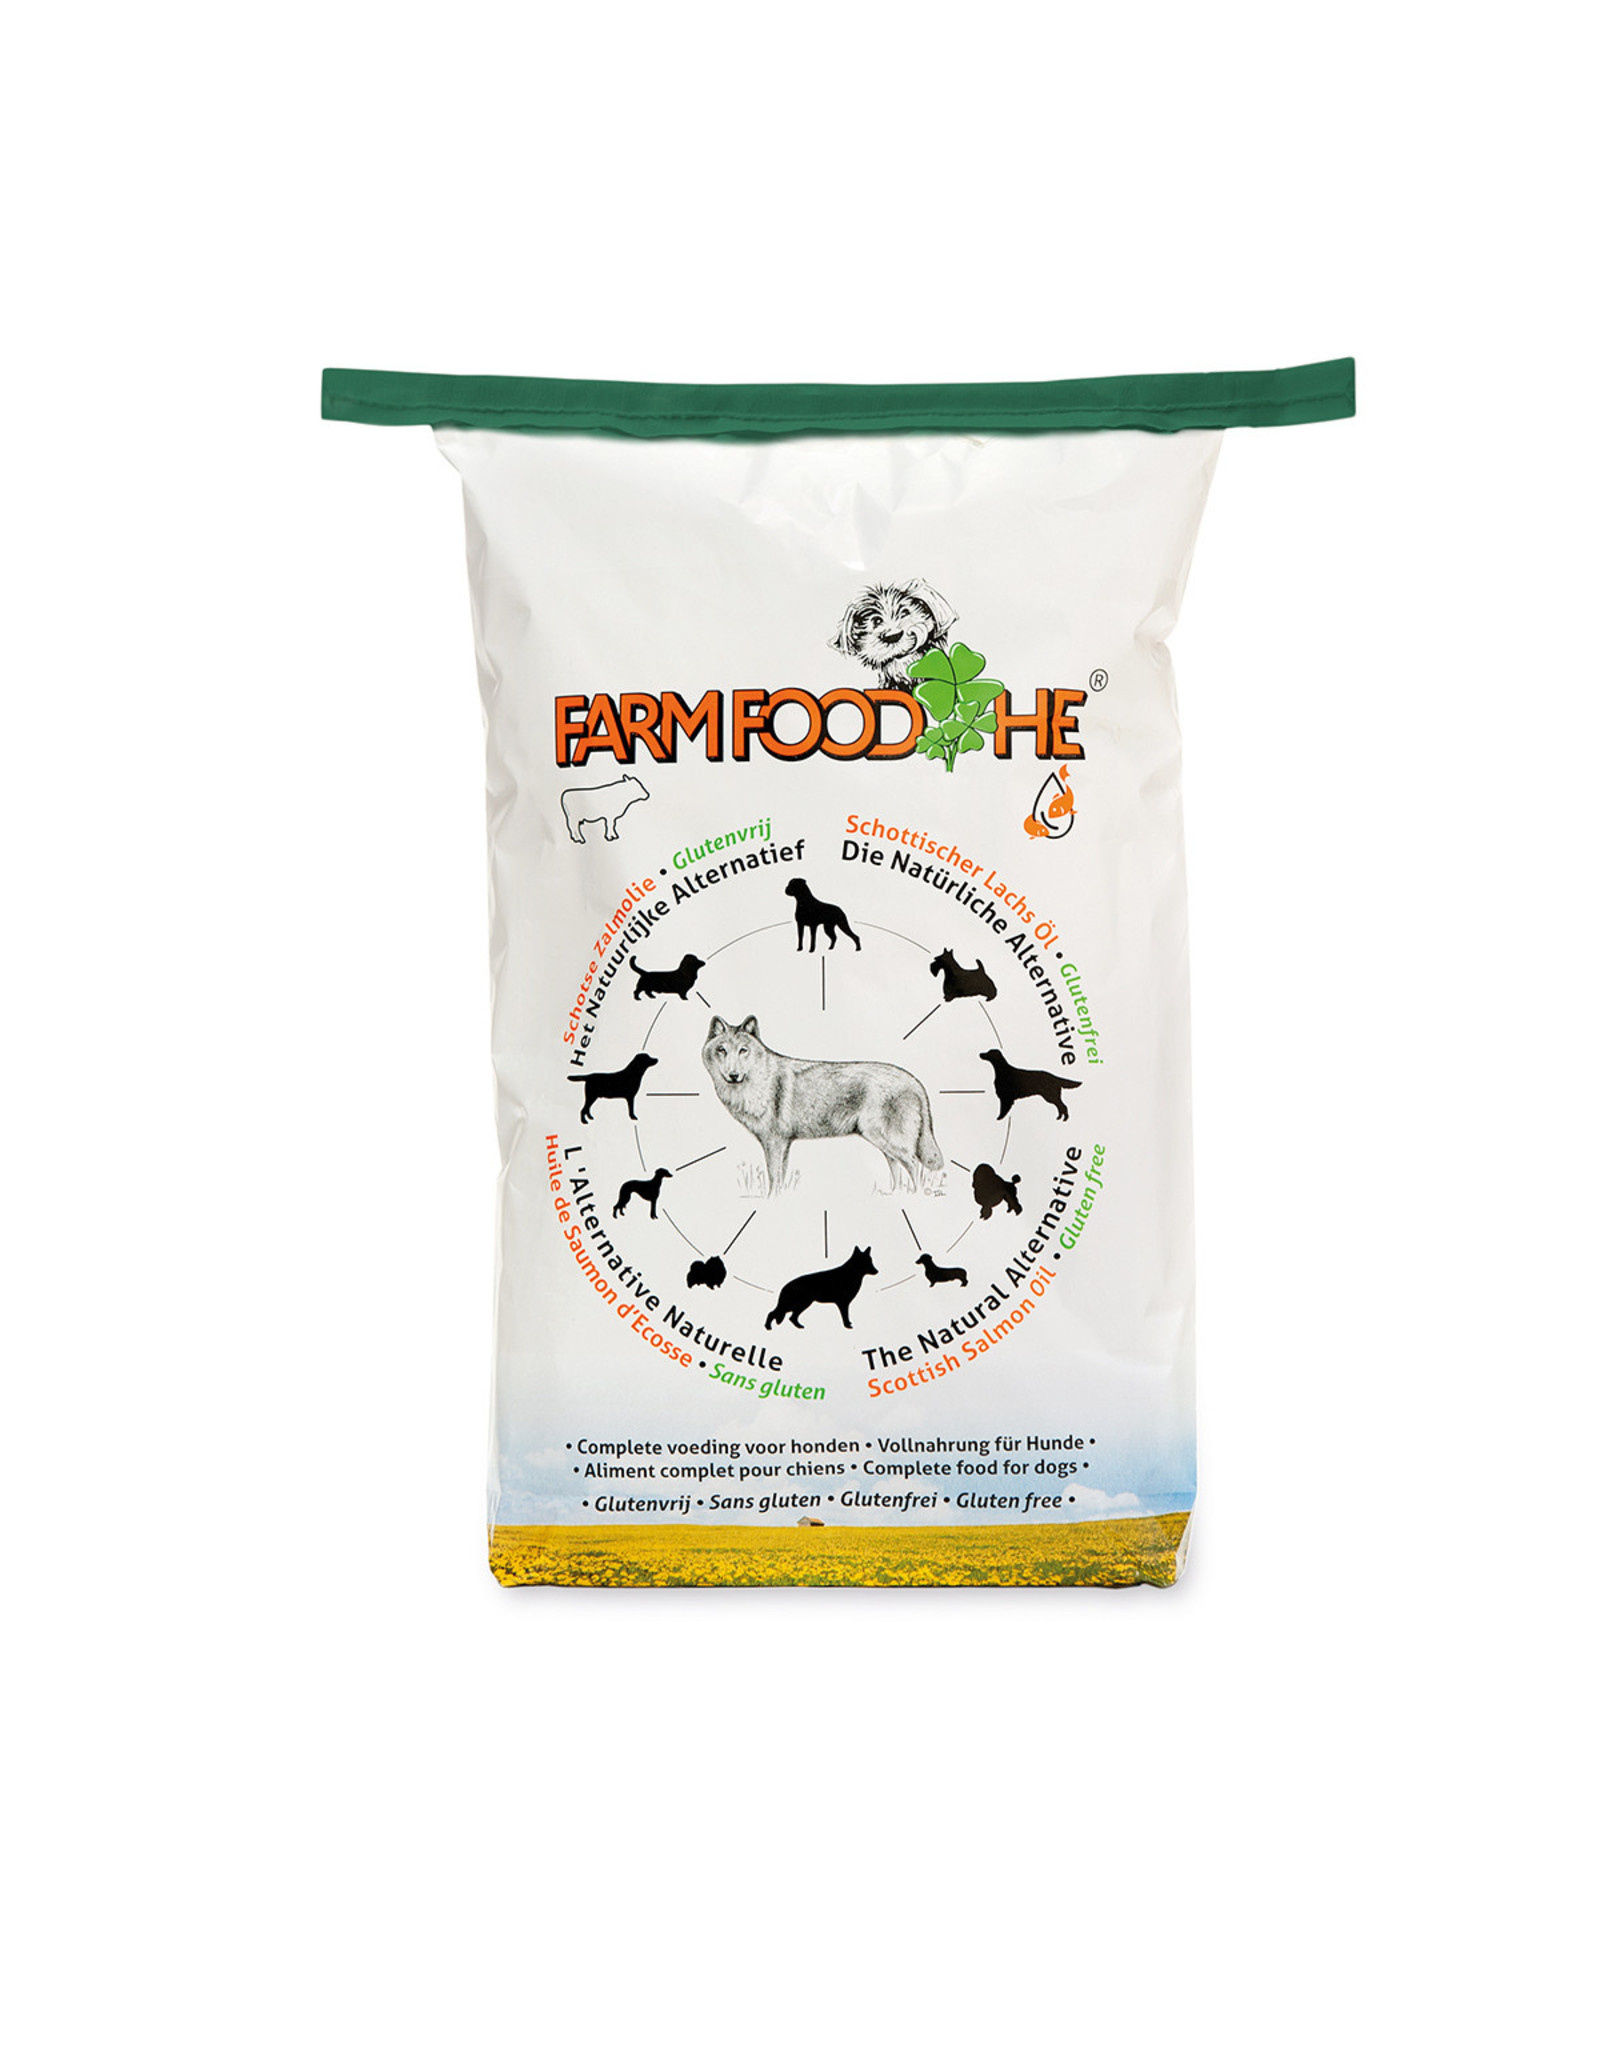 FarmFood HE- Glutenvrij 15 kg (papier)